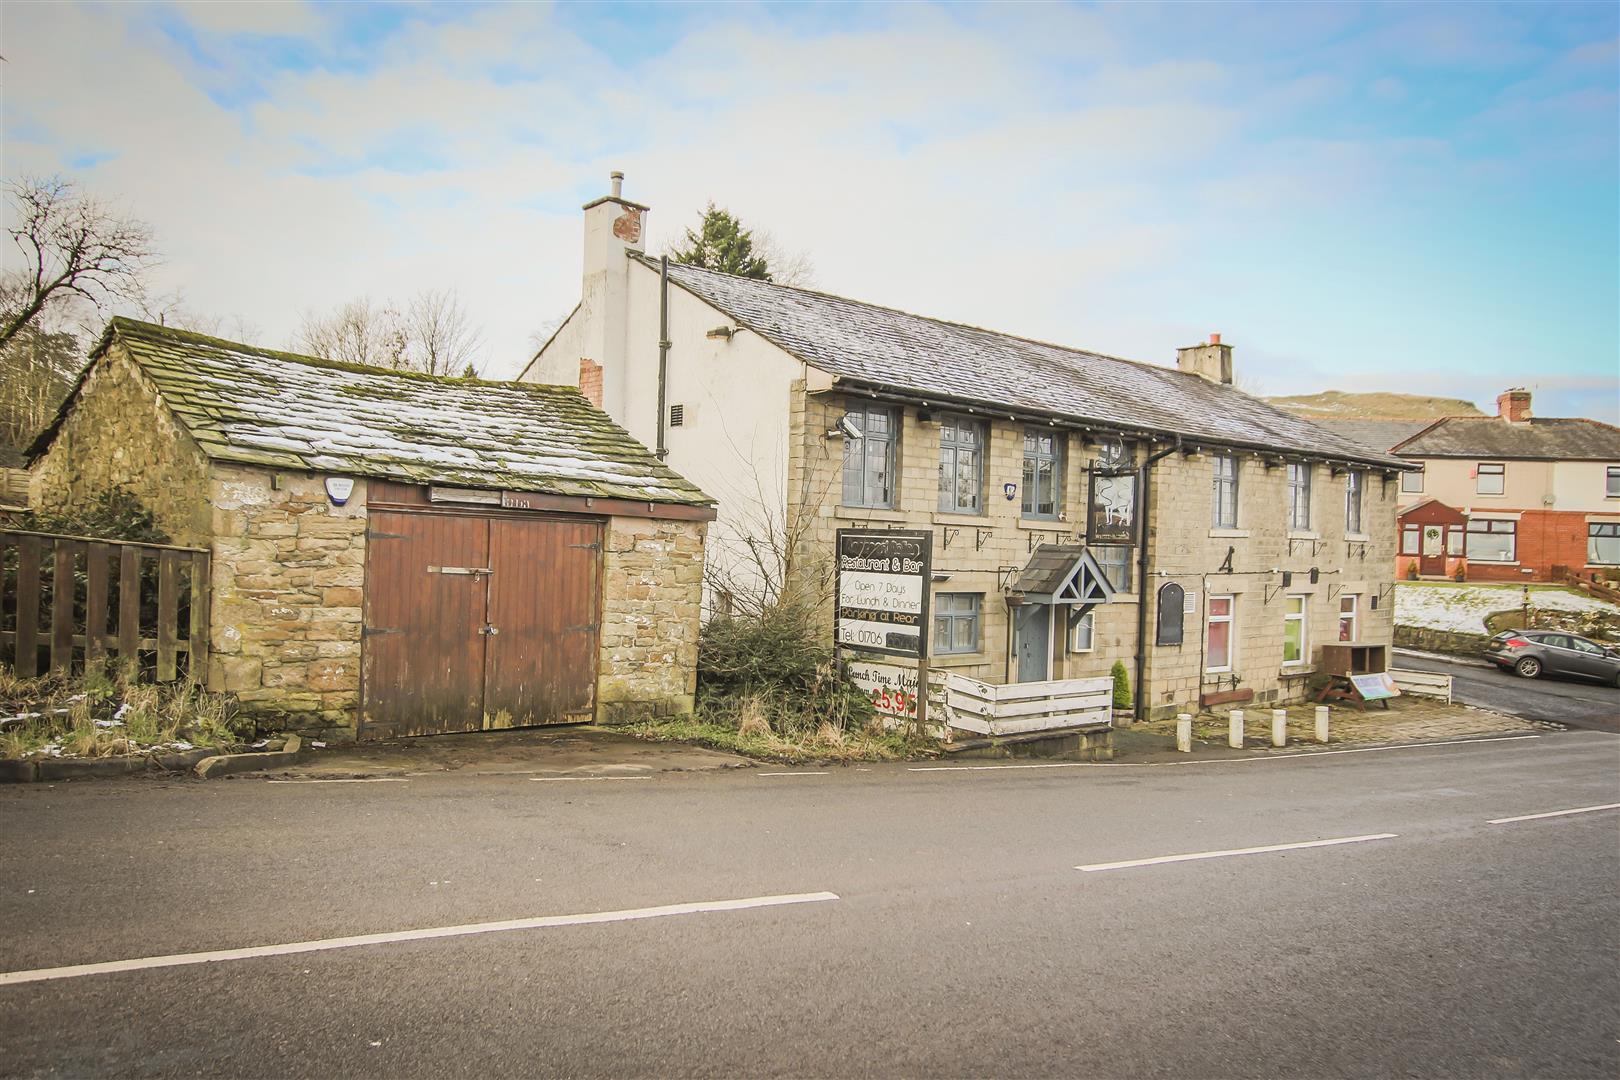 Development Site Land For Sale - Image 10